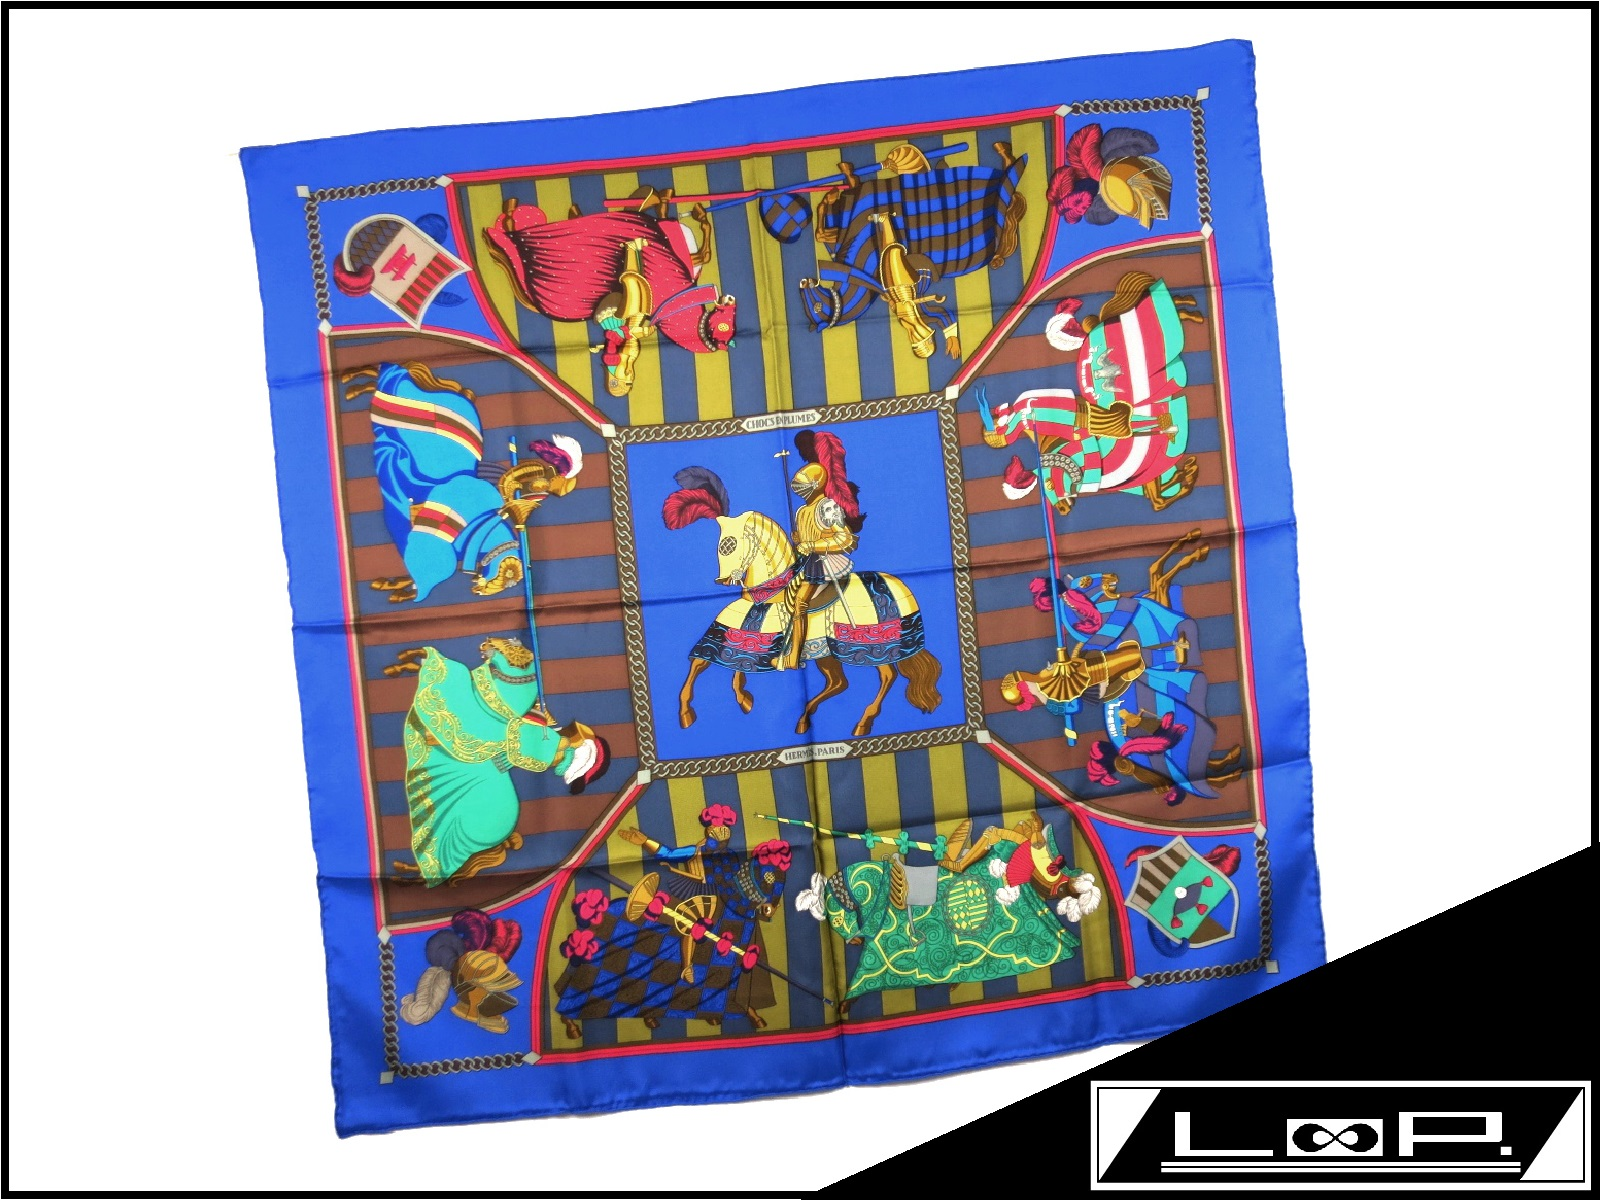 【SALE】【新同】 エルメス カレ 90 スカーフ CHOCS EN PLUMES 羽飾りの激突 騎士 馬 ブルー アオ 青 シルク 【A17118】 【中古】